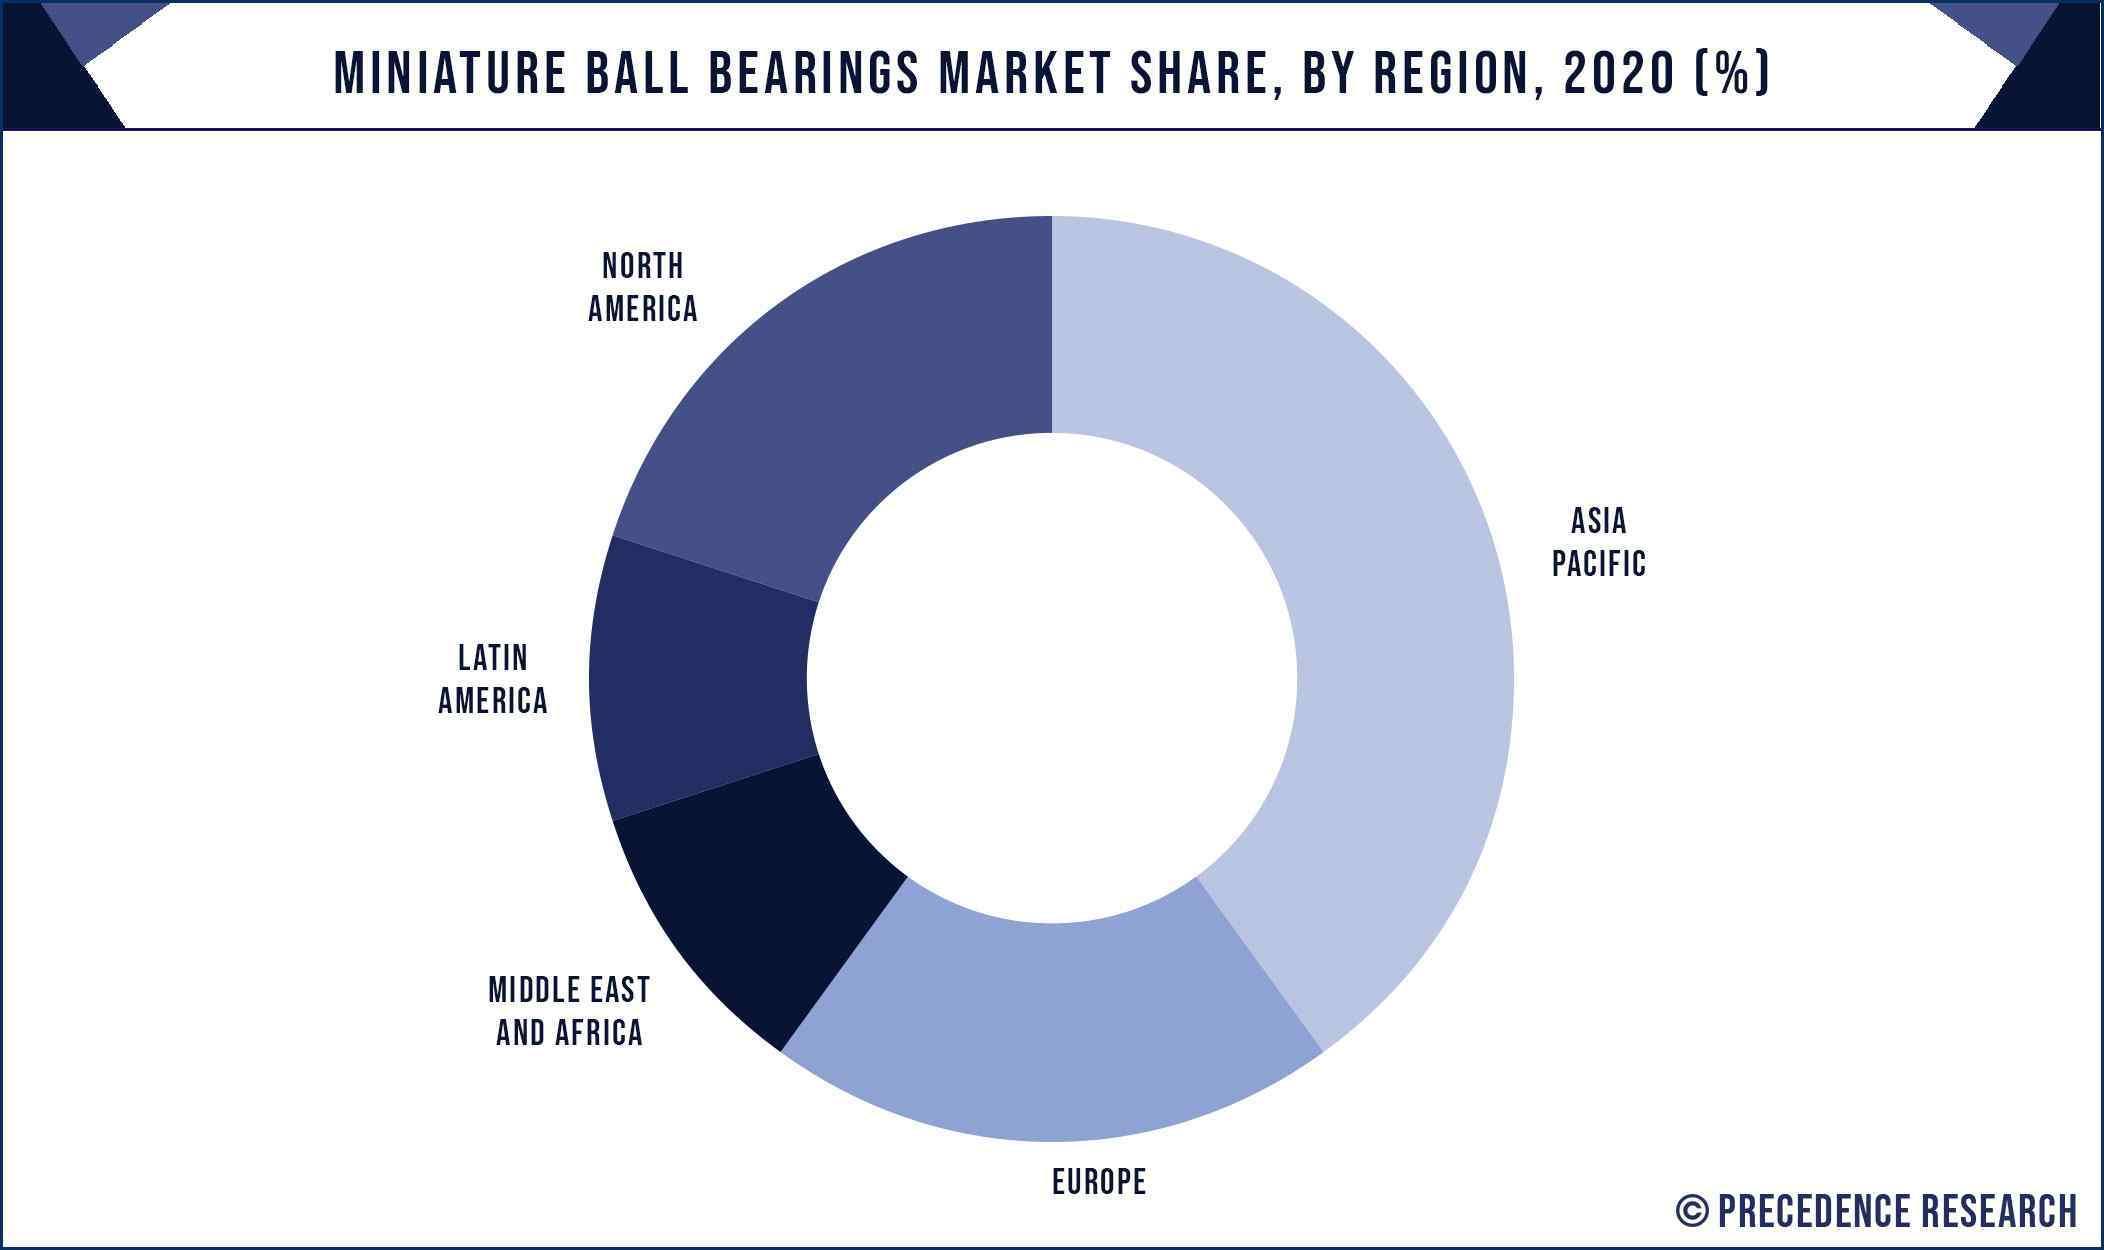 Miniature Ball Bearings Market Share, By Region, 2020 (%)